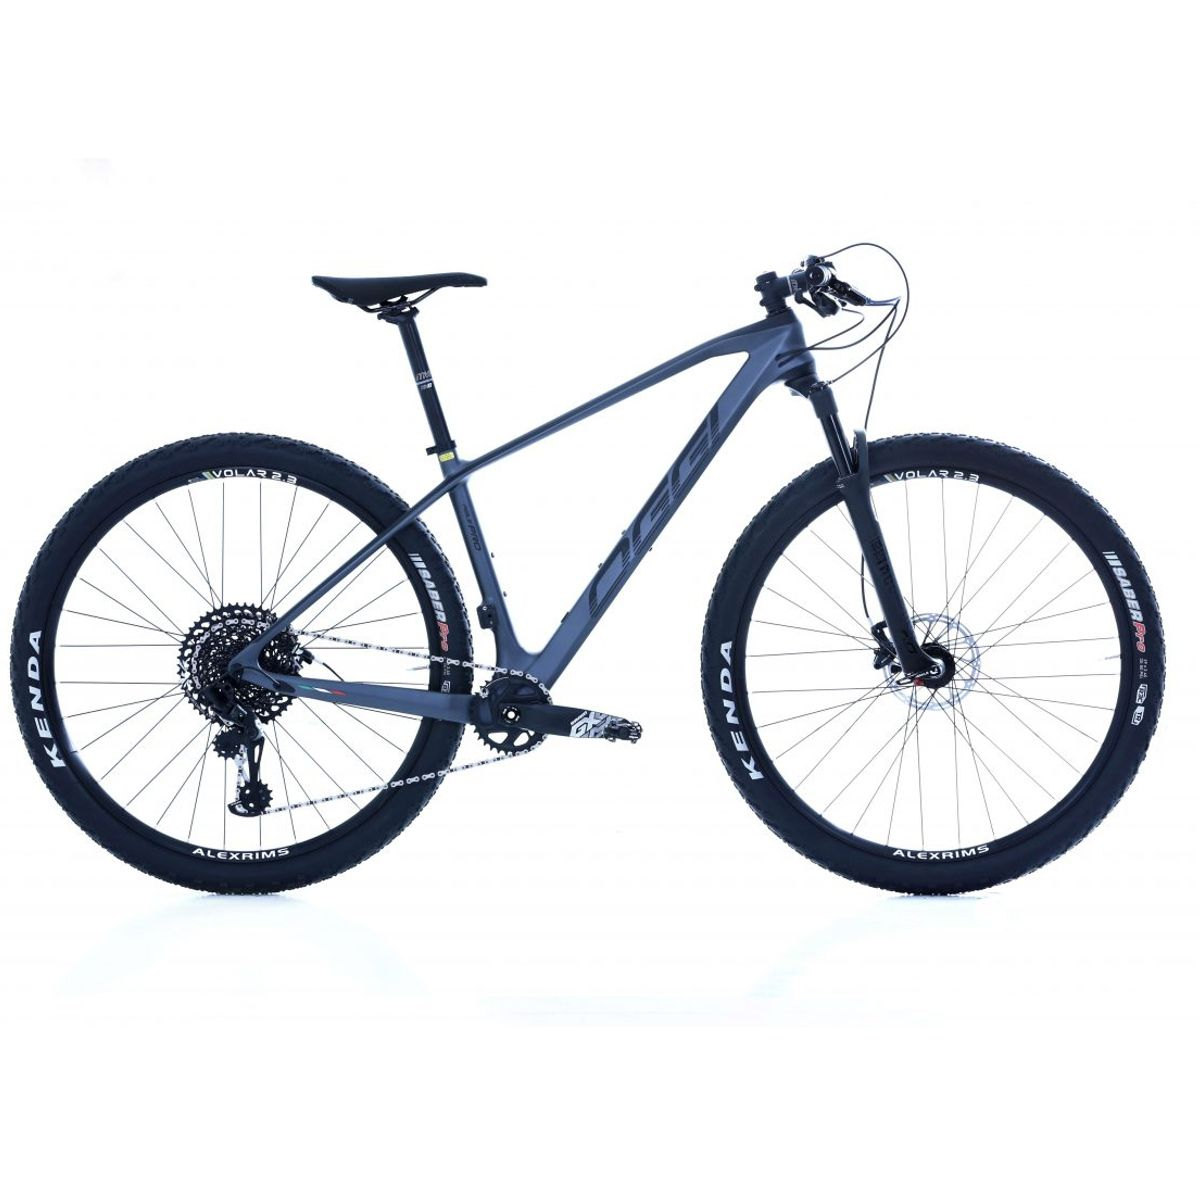 Bicicleta OGGI AGILE PRO CARBON 2019 SRAM GX 12V